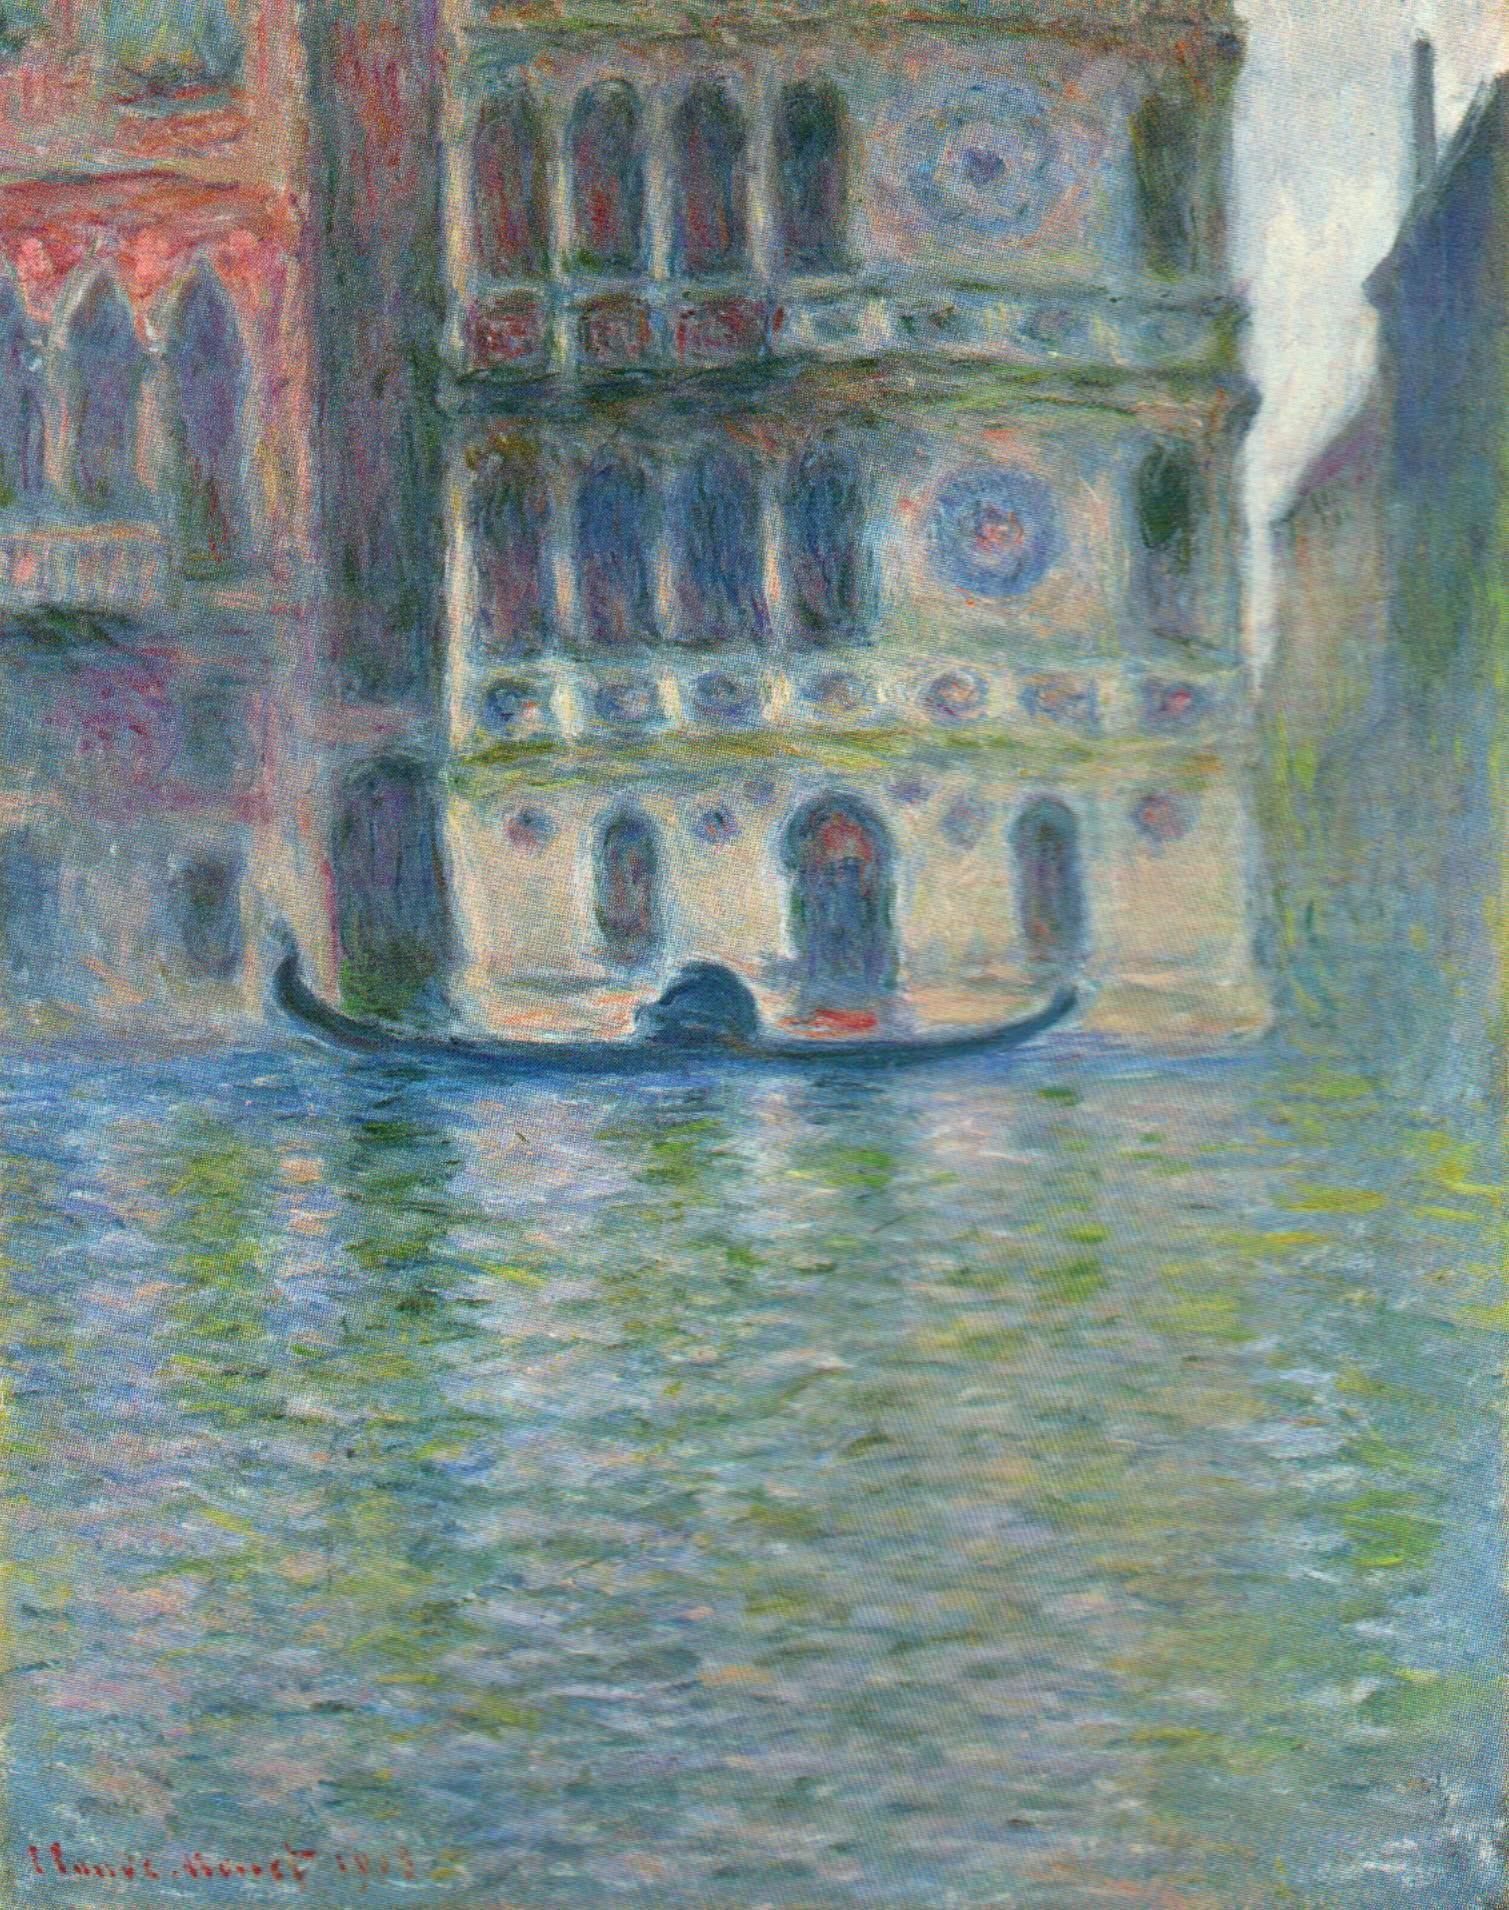 File:Claude Monet - Palazzo Dario, Venice.JPG - Wikimedia Commons